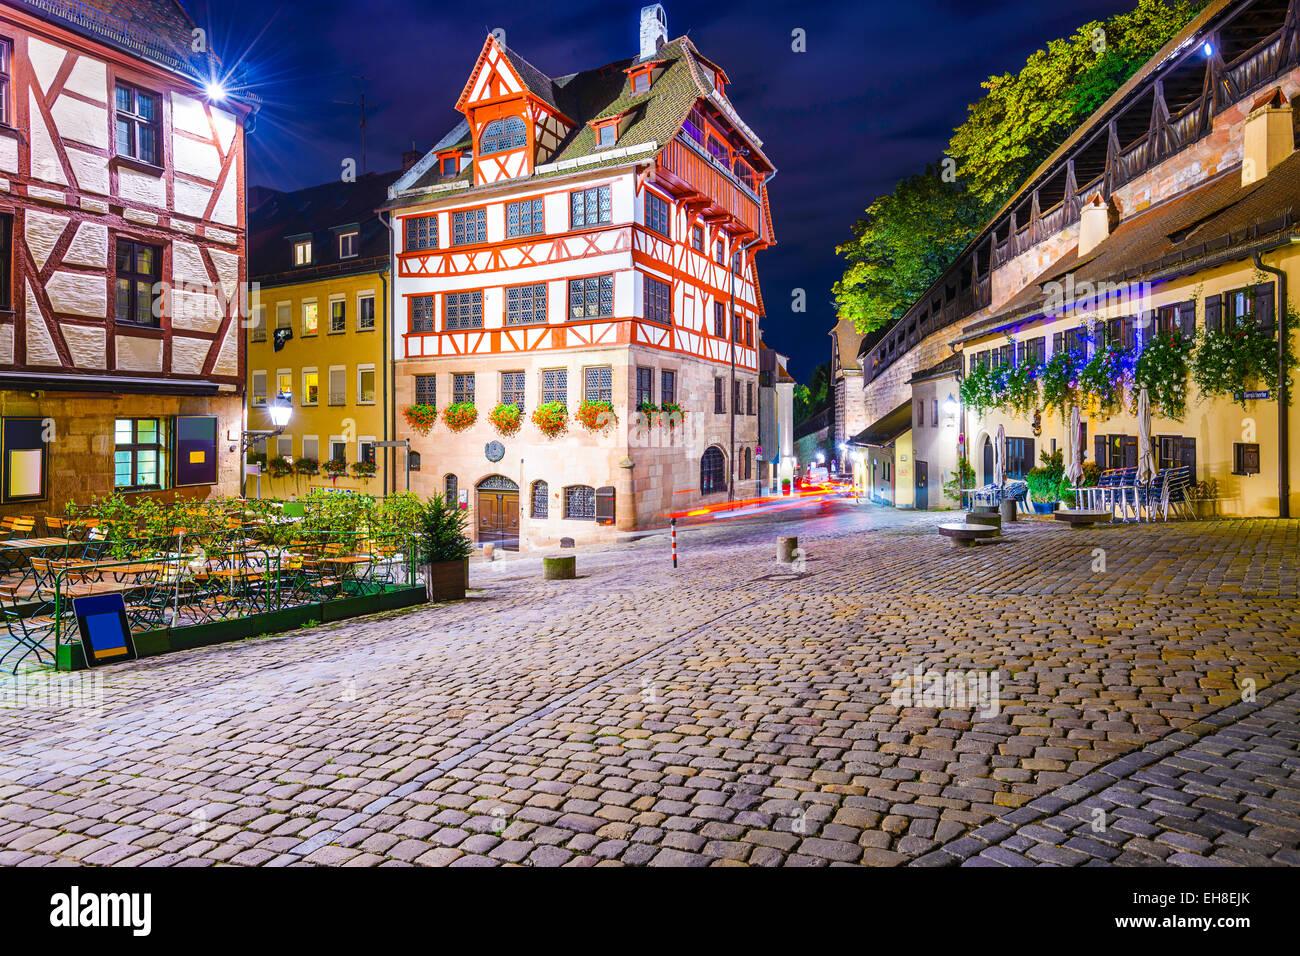 Nuremberg, Germany at the Albrecht Durer House. - Stock Image